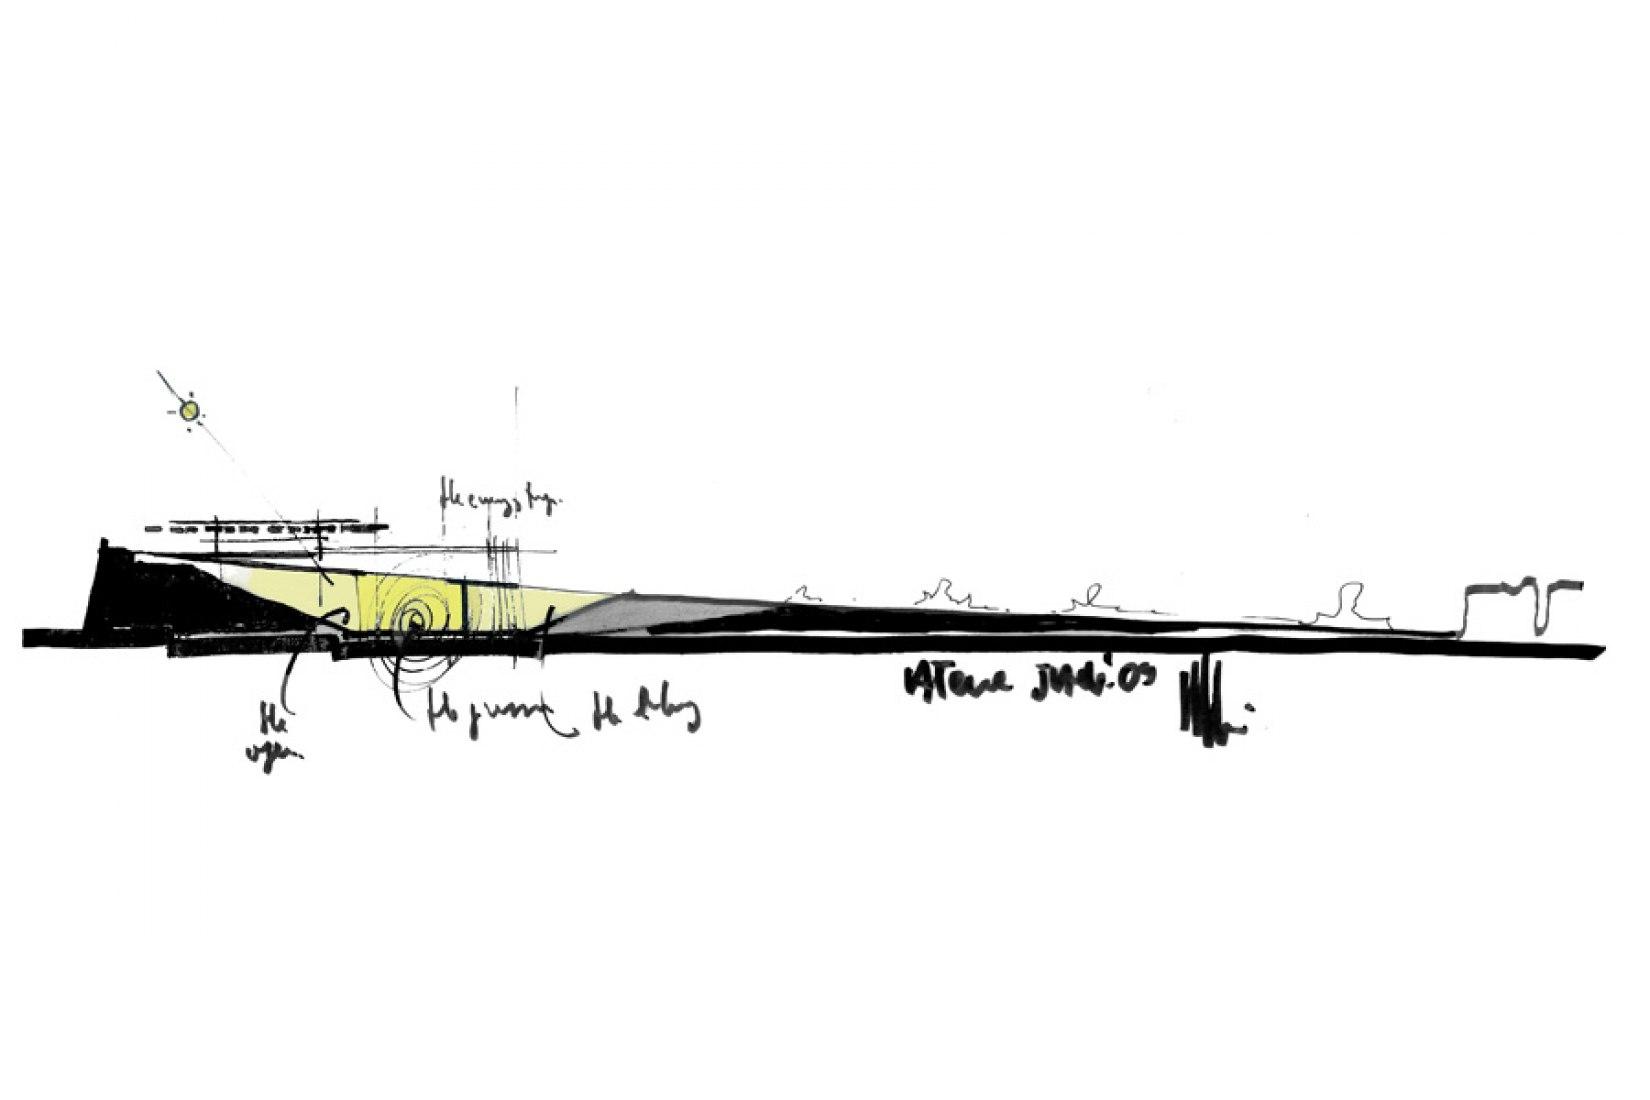 Renzo Piano sketch. © RPBW